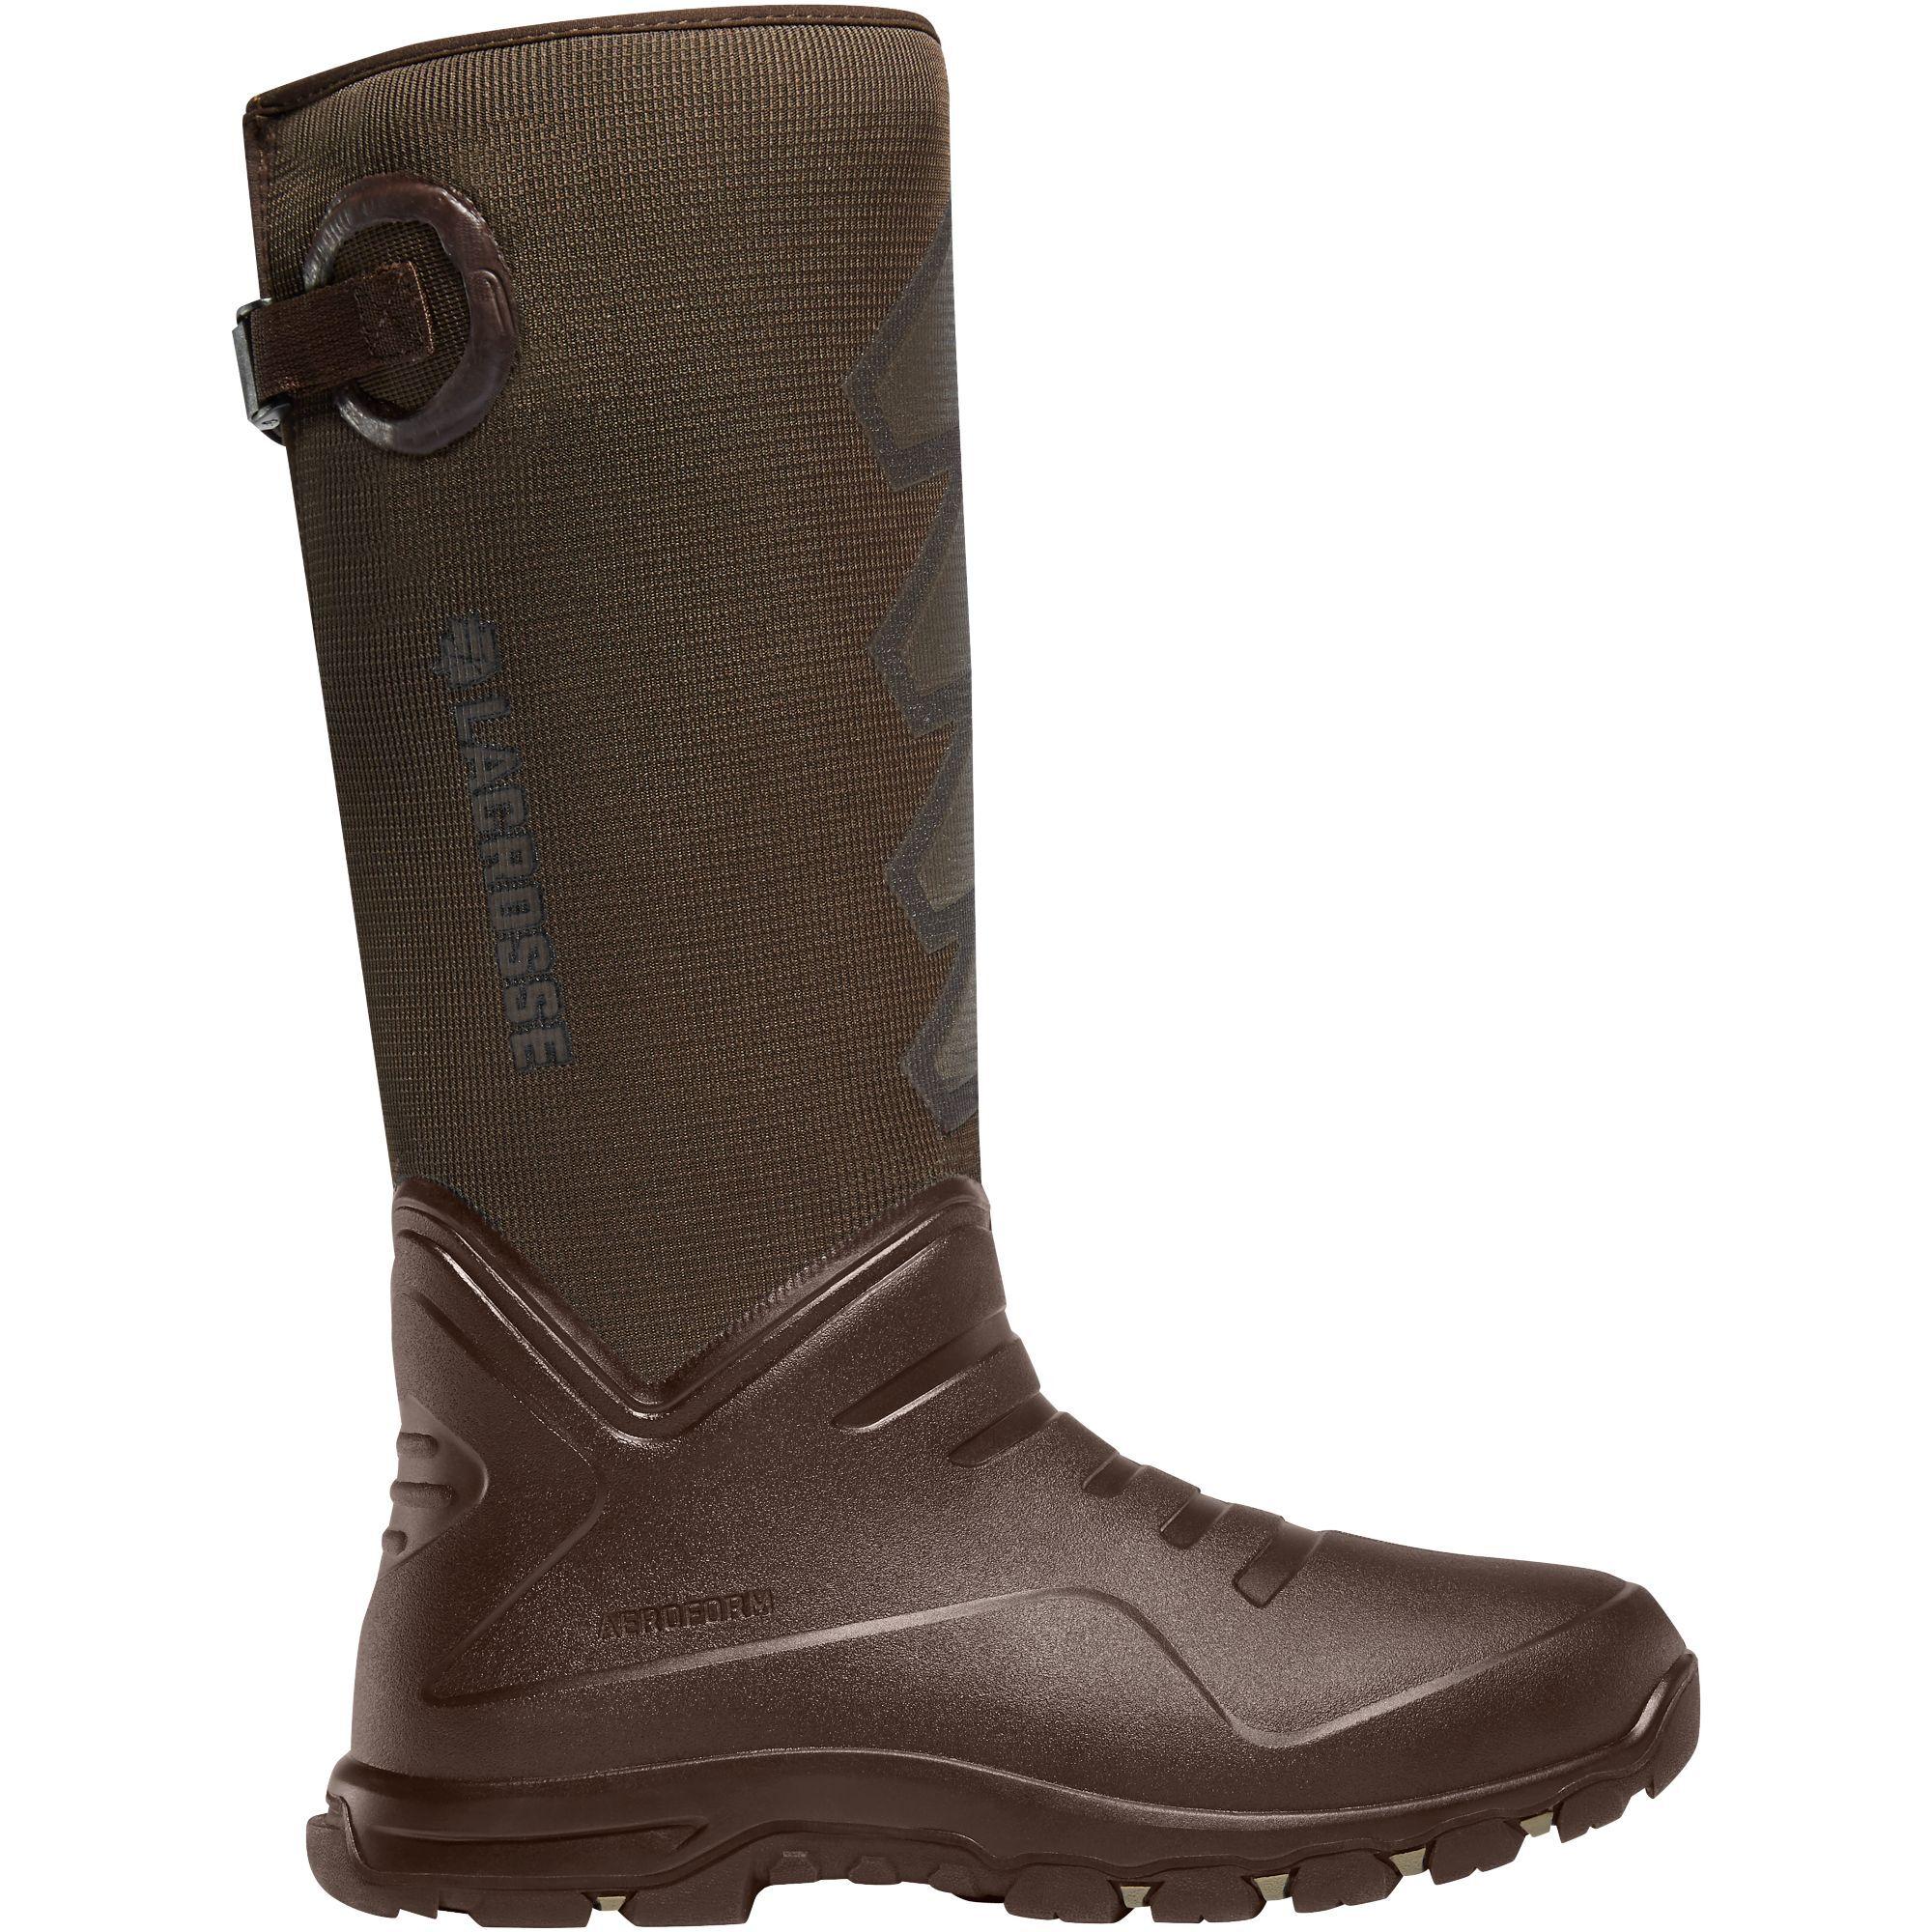 "LaCrosse AeroHead Sport 16"" 7mm Boots (13)- Brown"